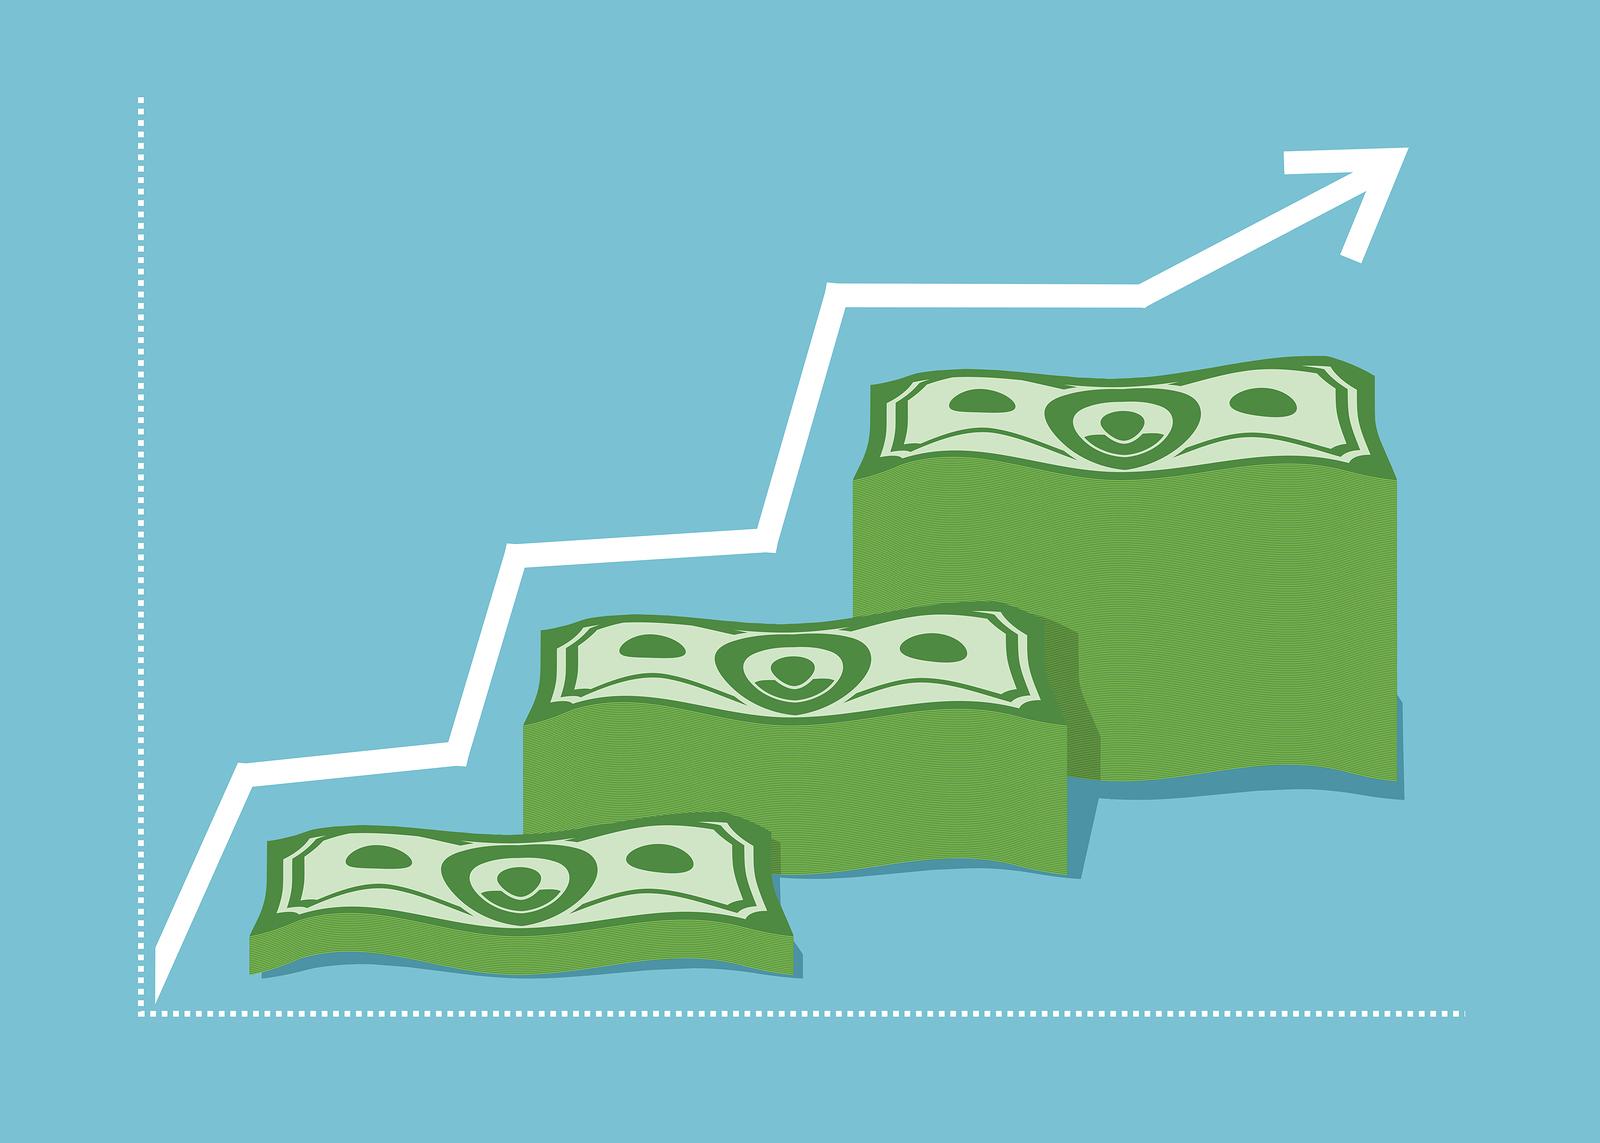 Graph Money dollar. Increase revenue. The company profits. A pil